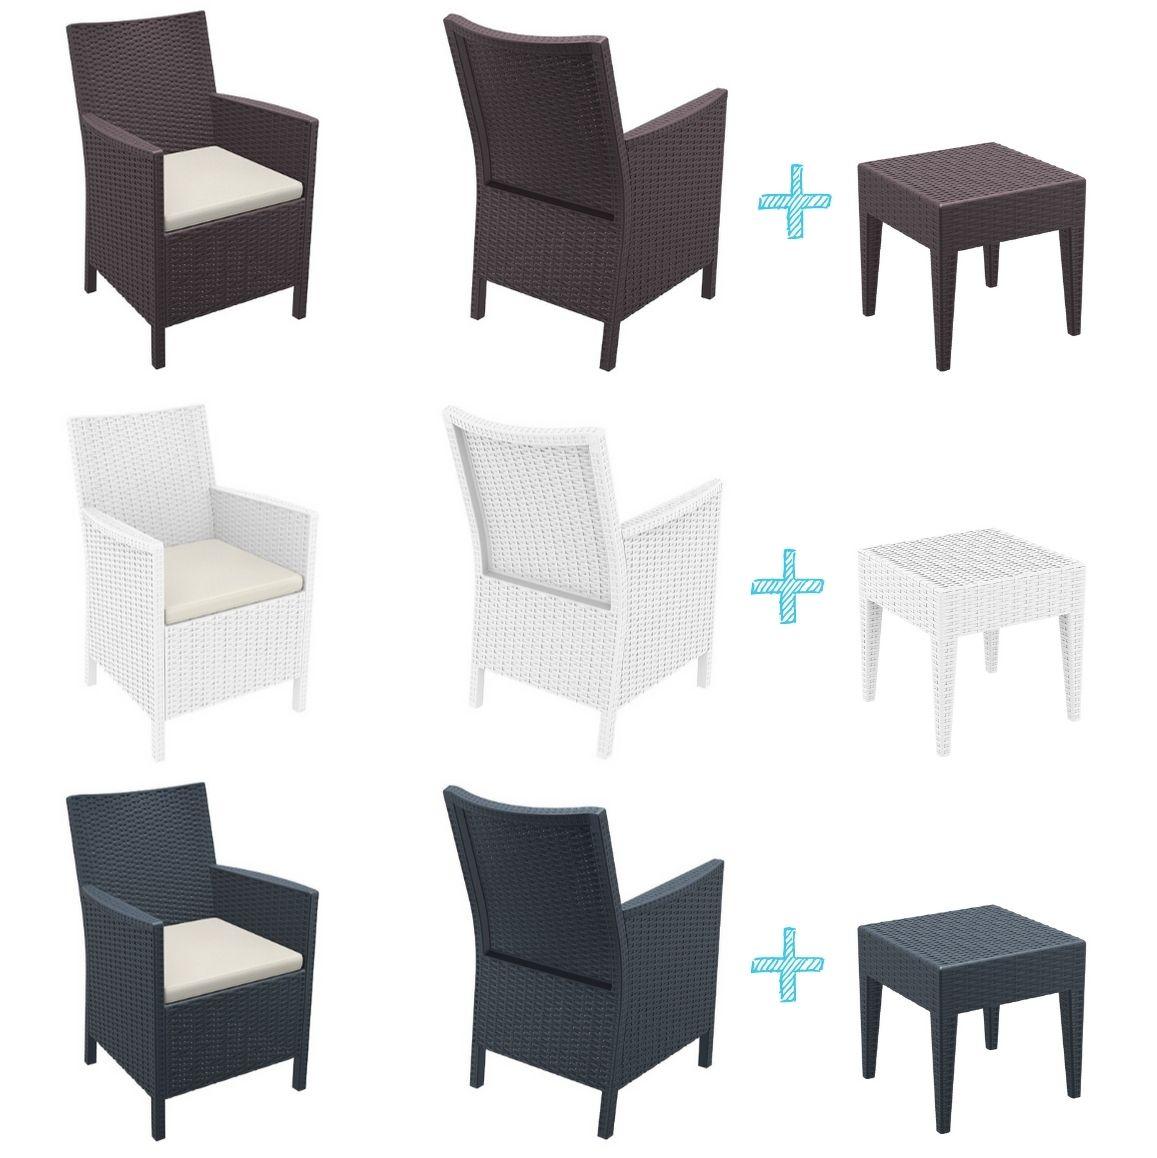 maui-wovenlook-seating-set-colors